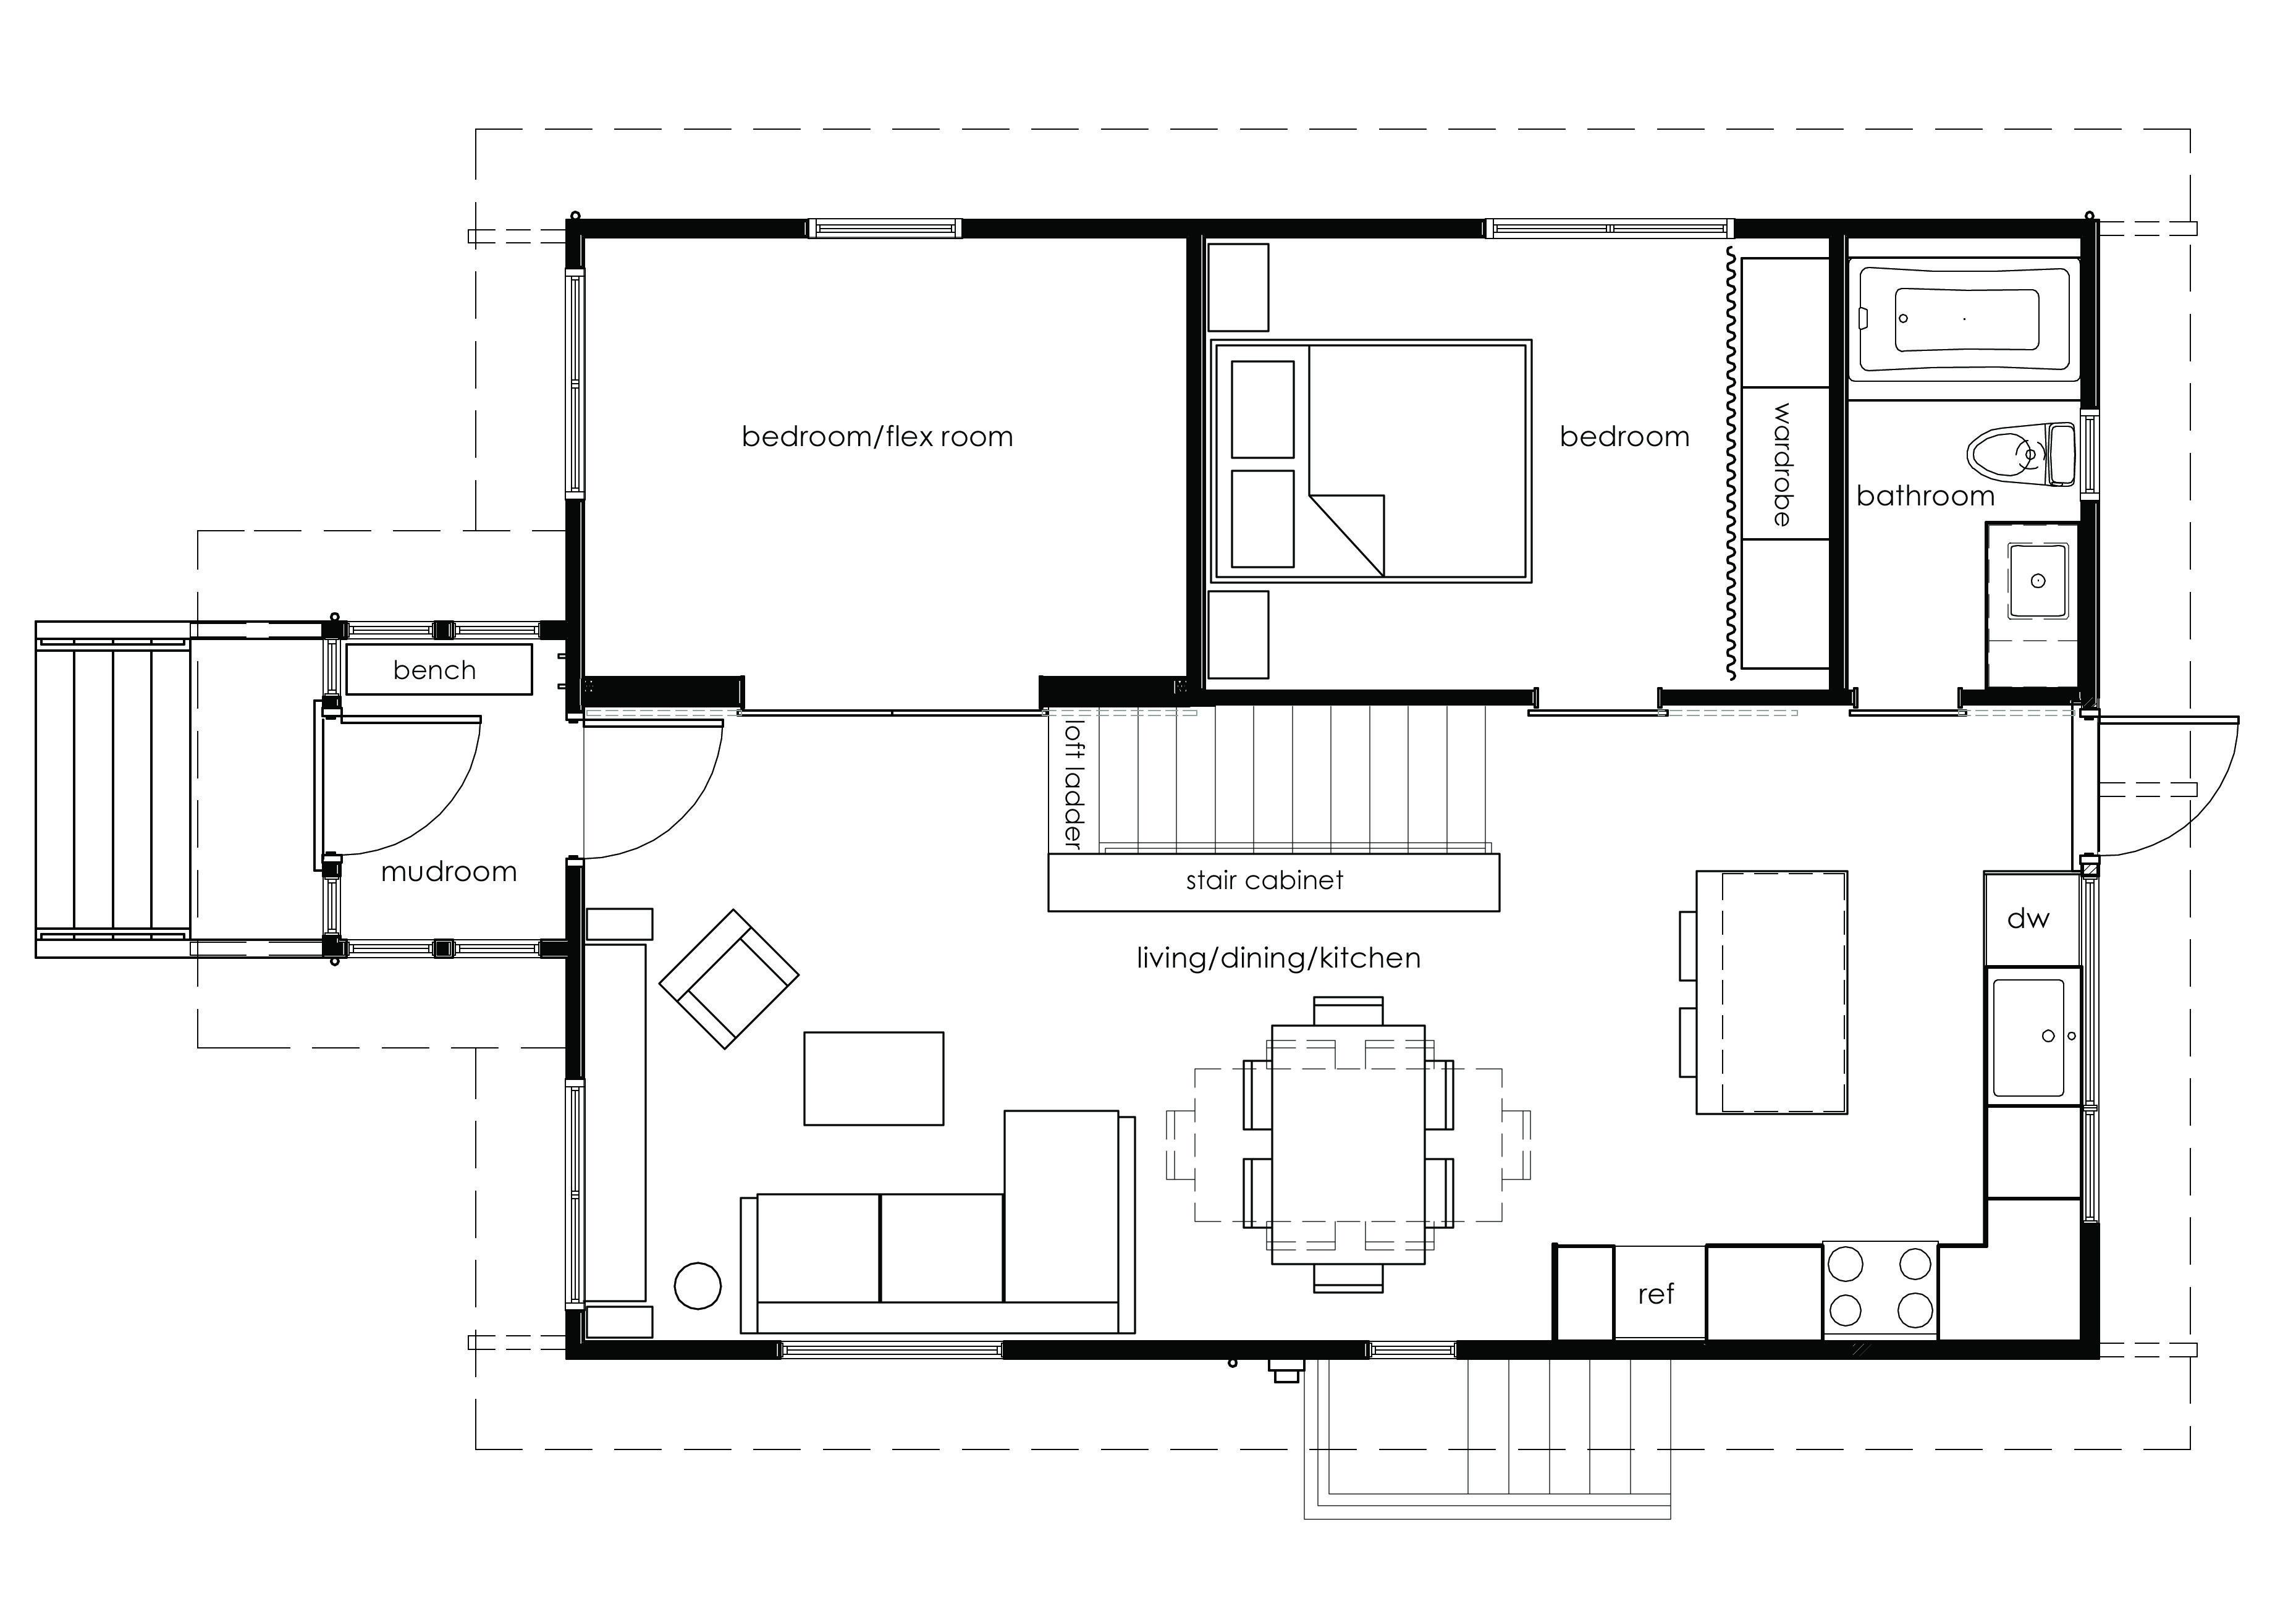 Floor Plan Furniture Planner Charming Idea 6 Floor Plan Living